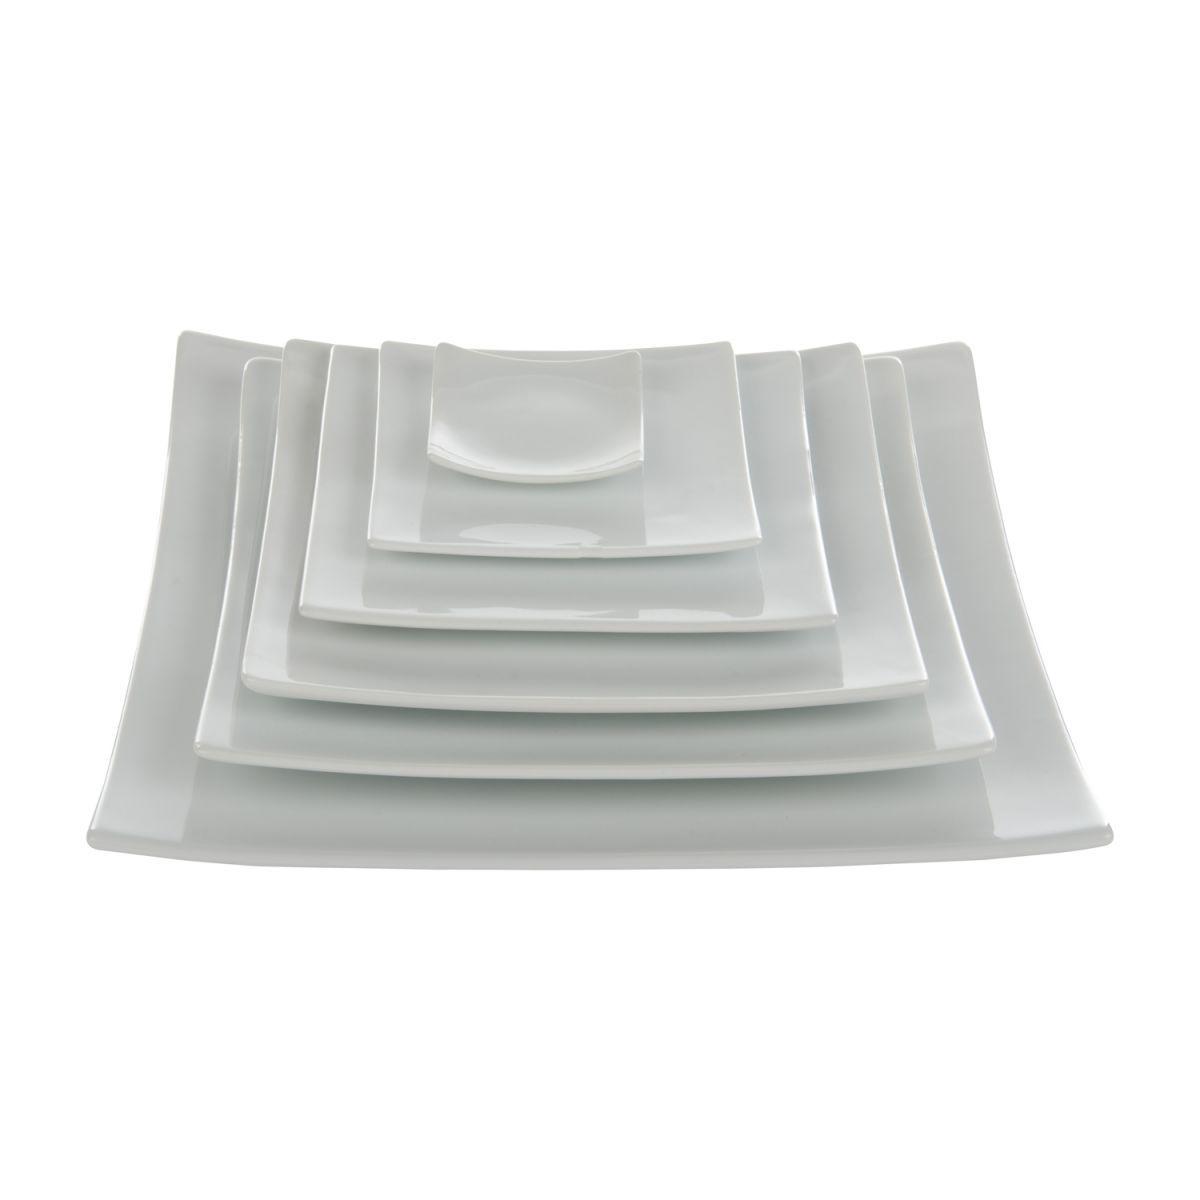 plate plain square 12 x 12 cm box6